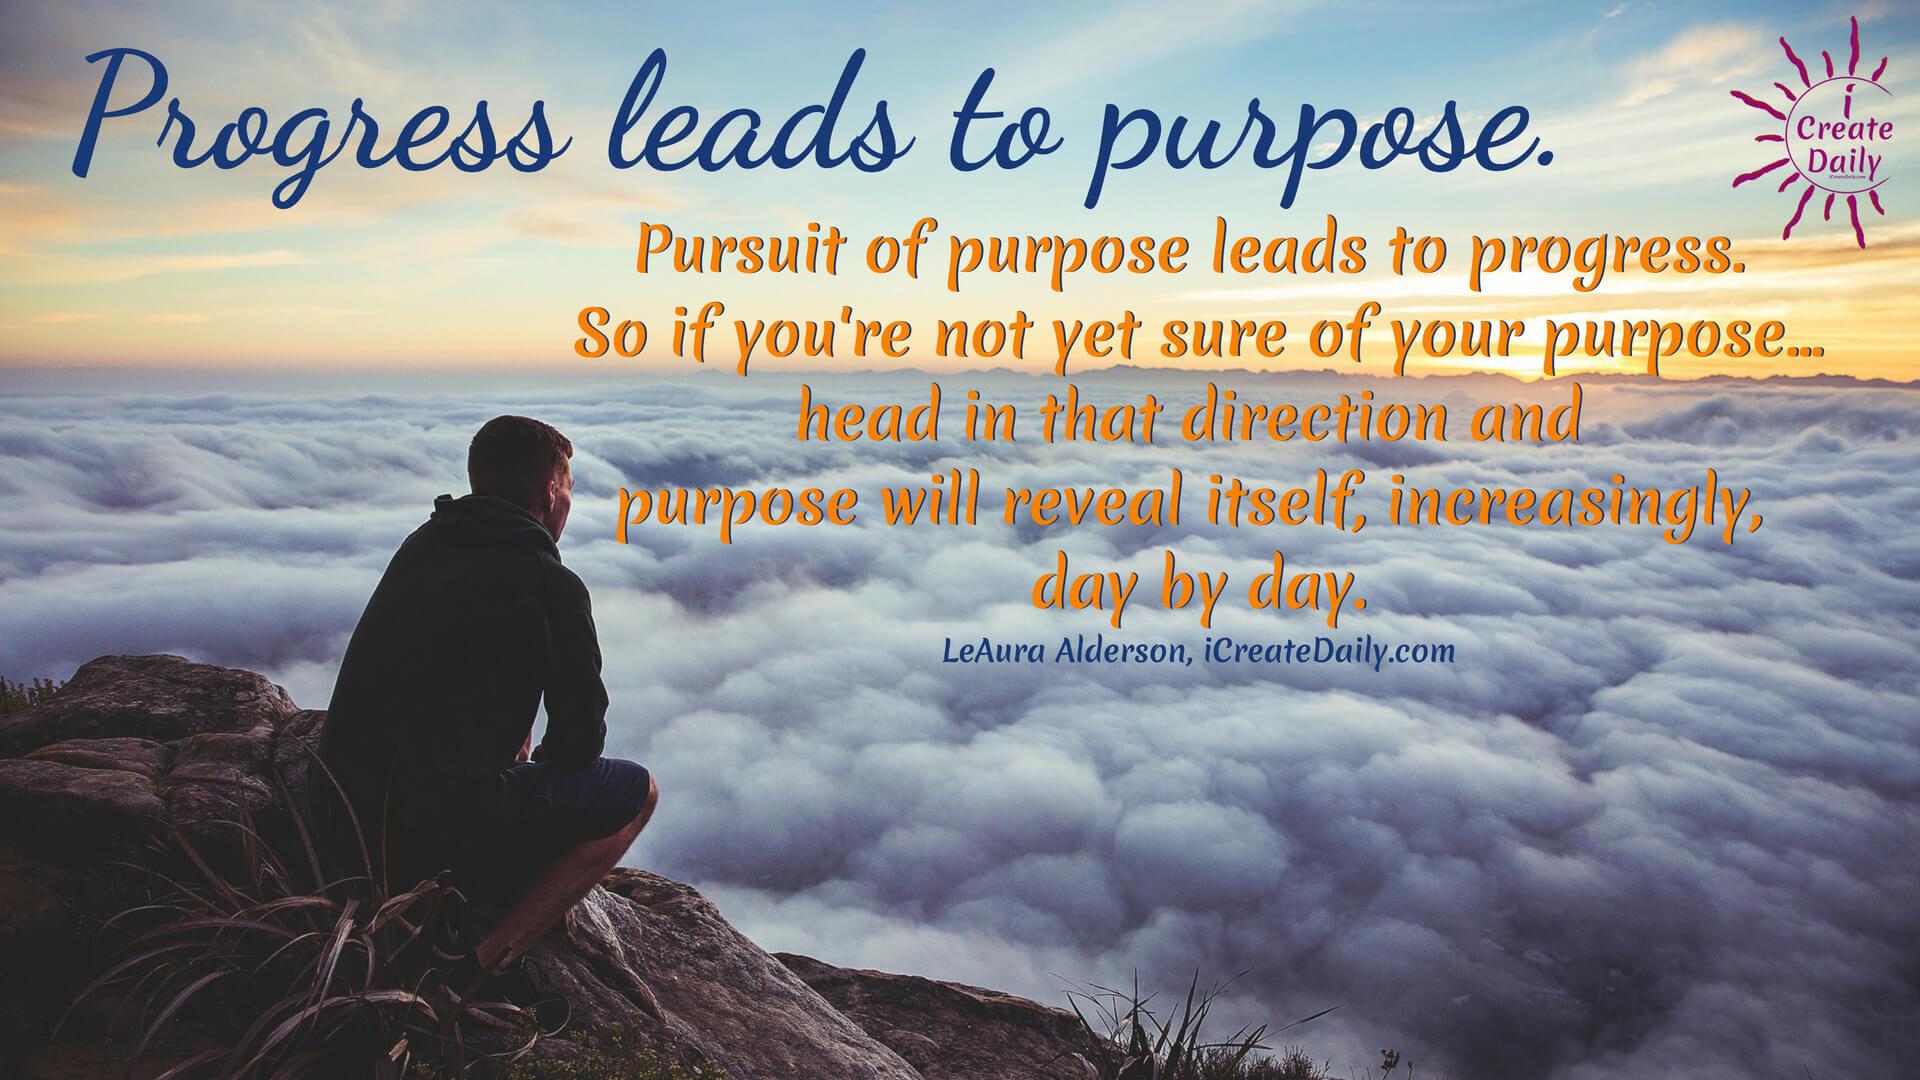 Pursuit of purpose leads to progress